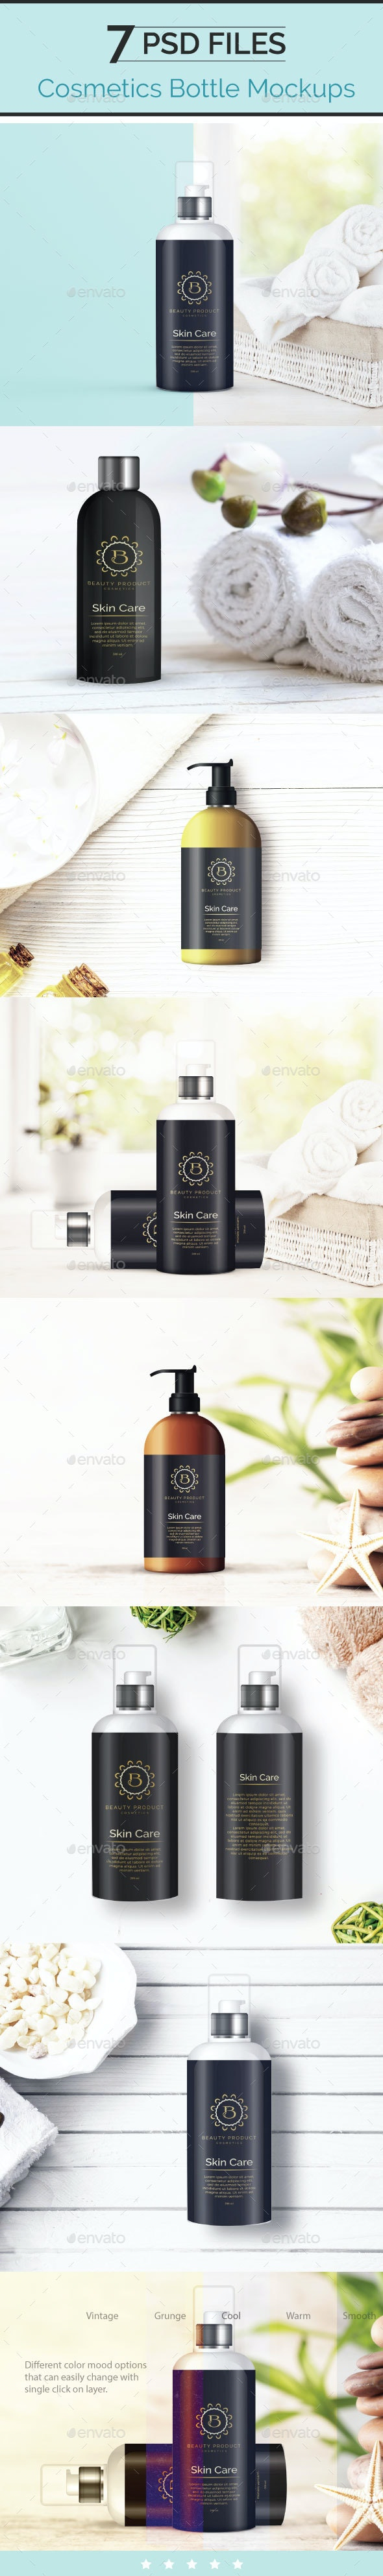 Cosmetic Bottle Mockup, Shampoo and Oil Bottle - Beauty Packaging